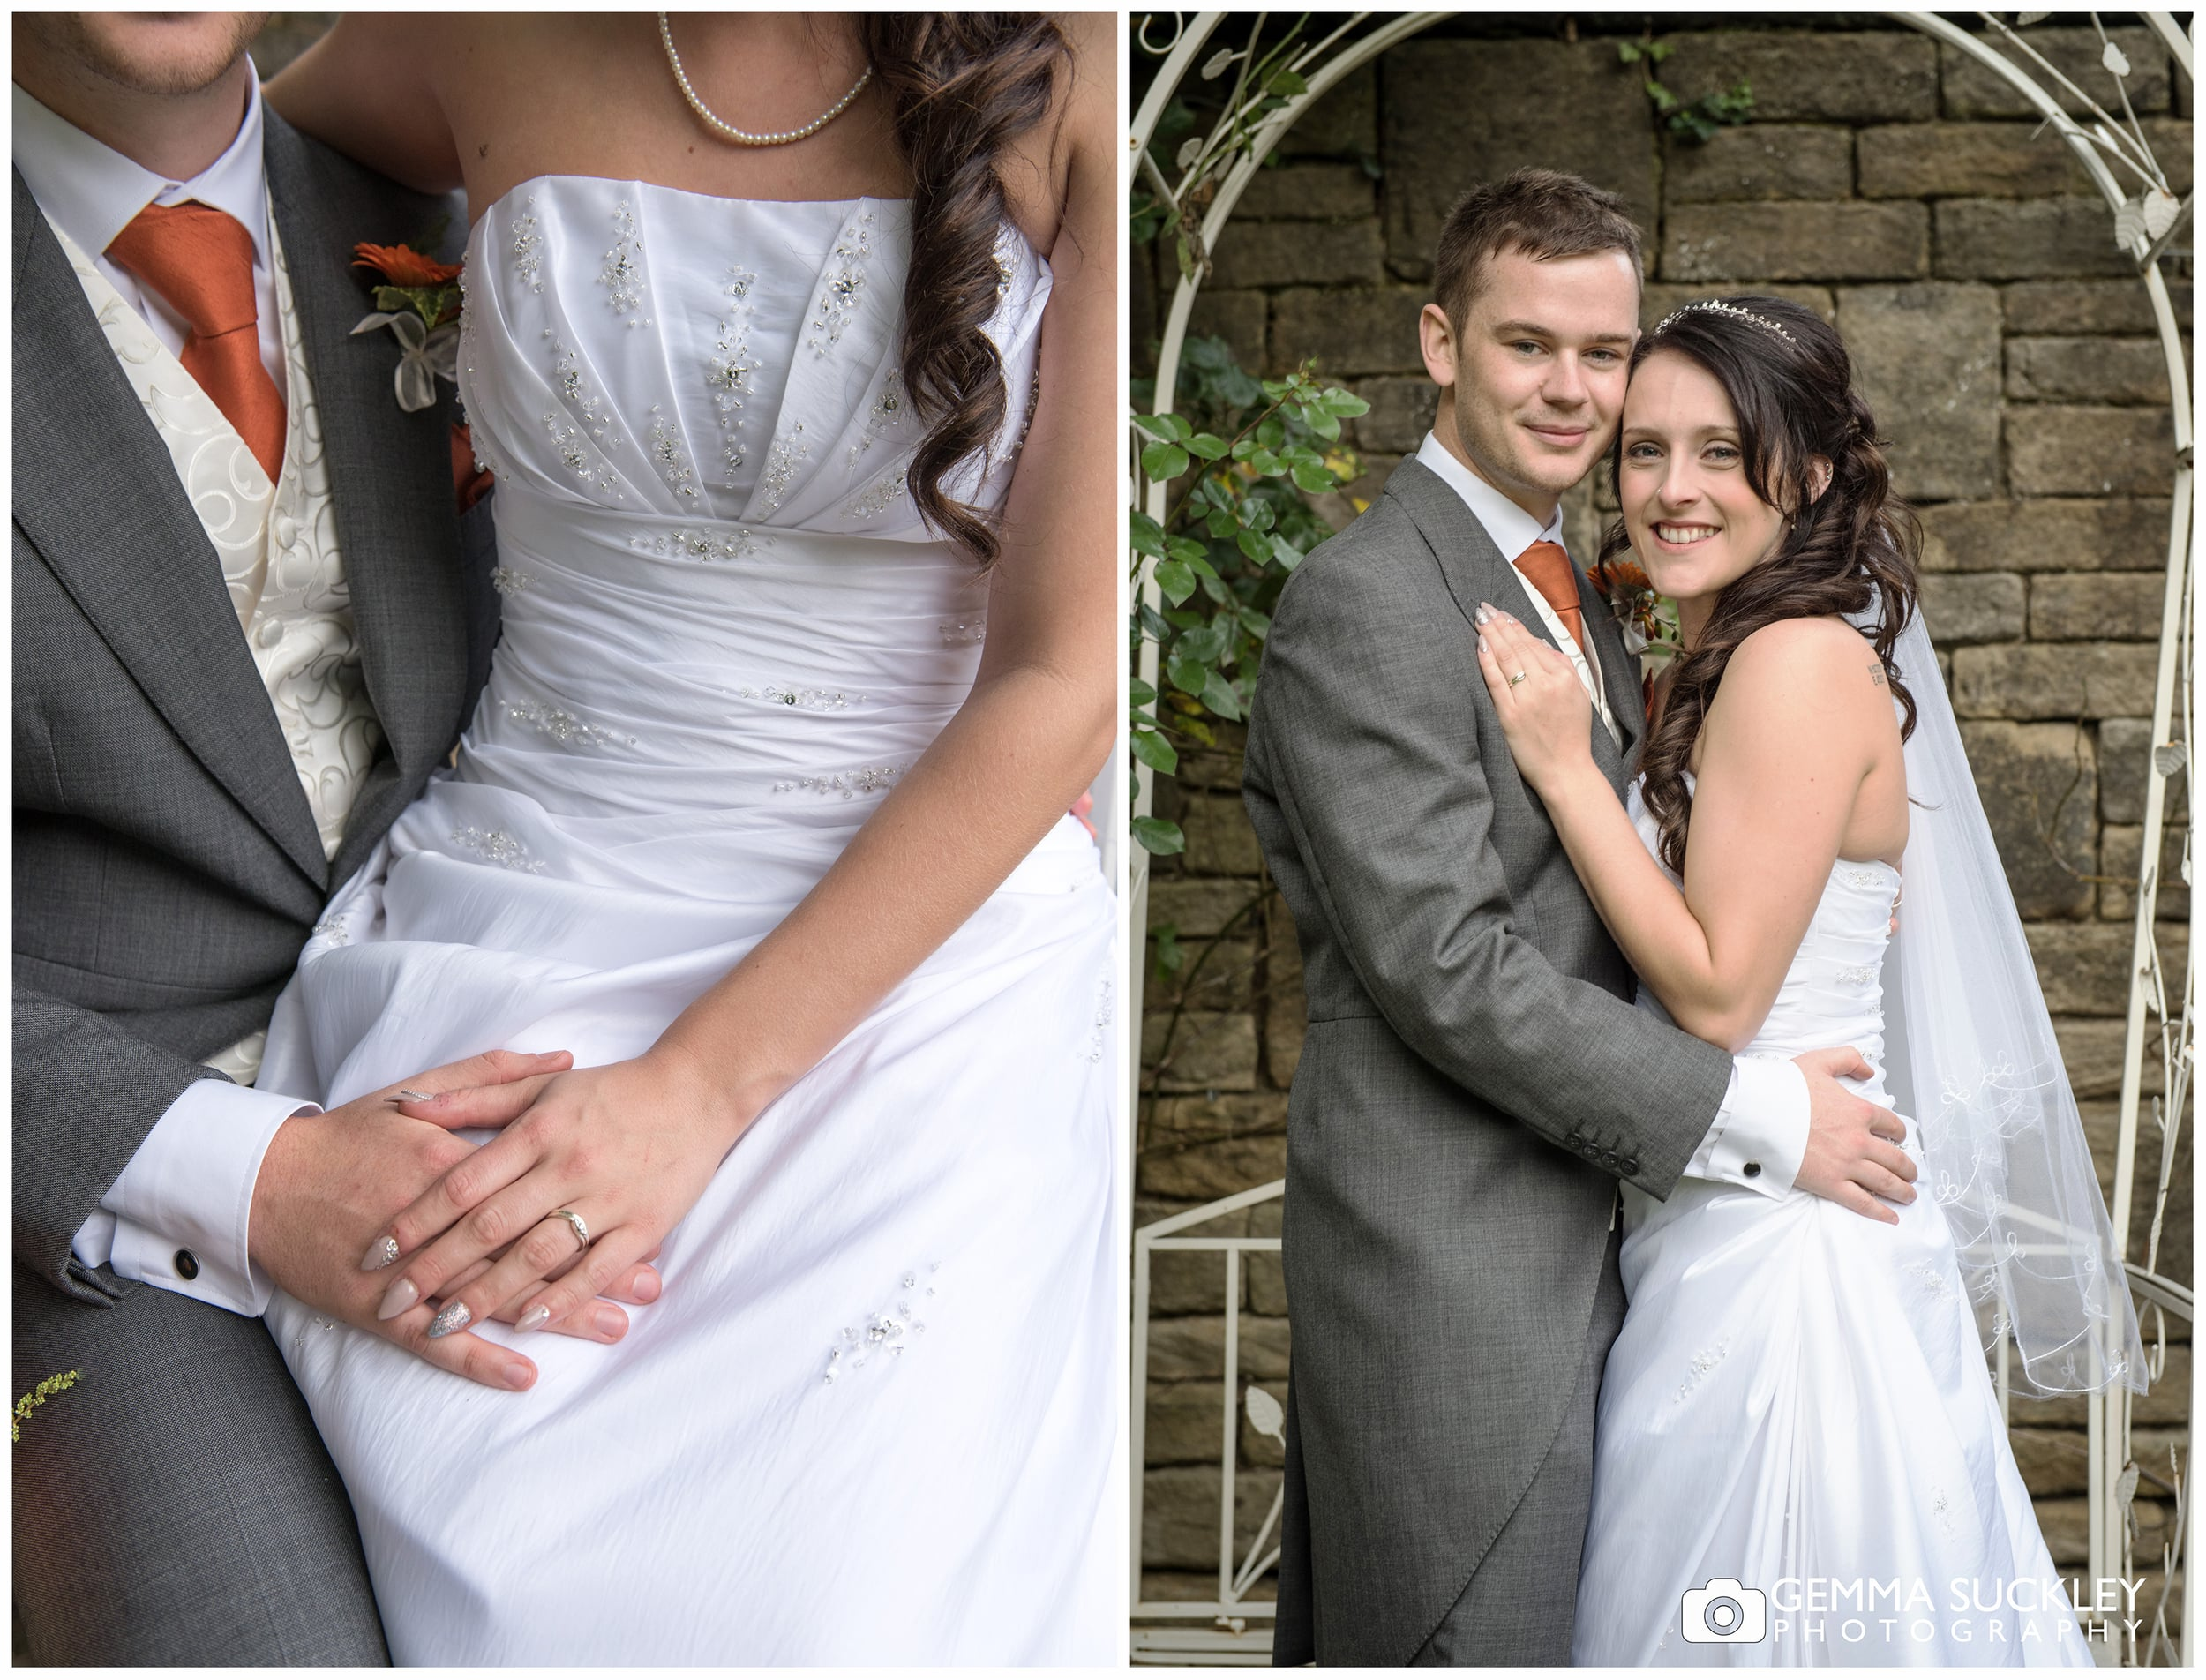 Hoyle-court-baildon-weddingj.jpg